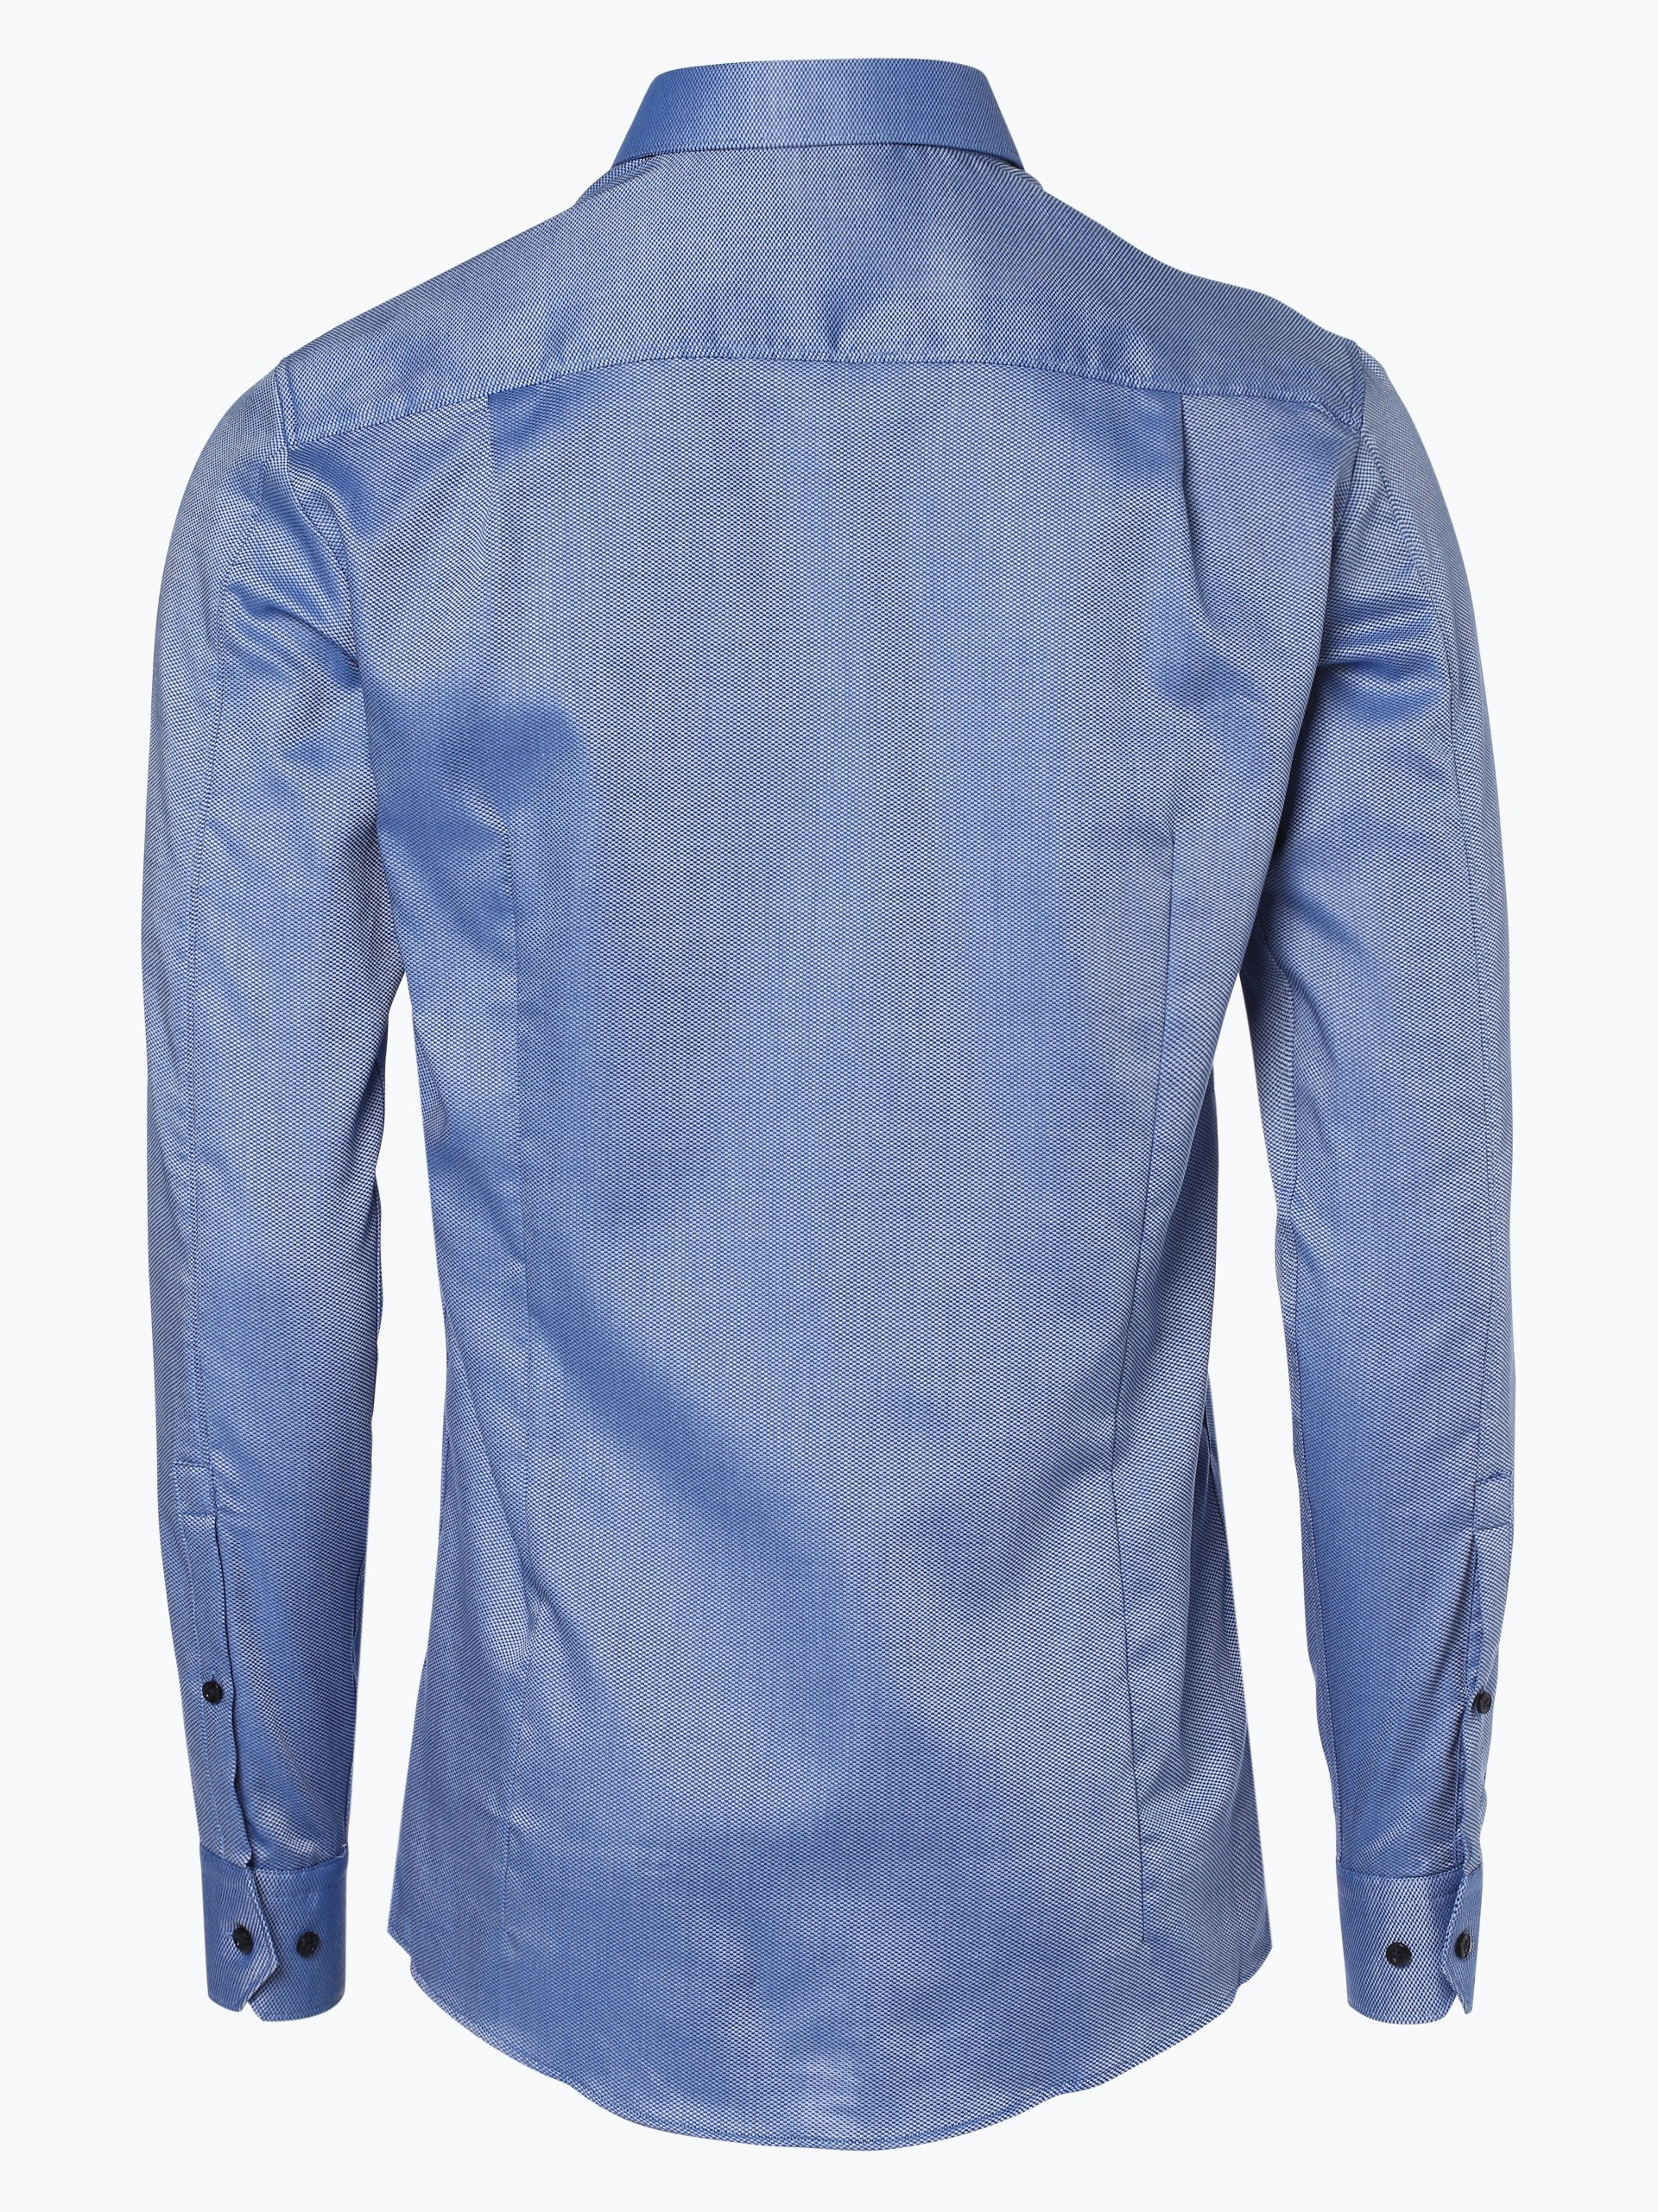 HUGO Herren Hemd Bügelleicht - Elisha01